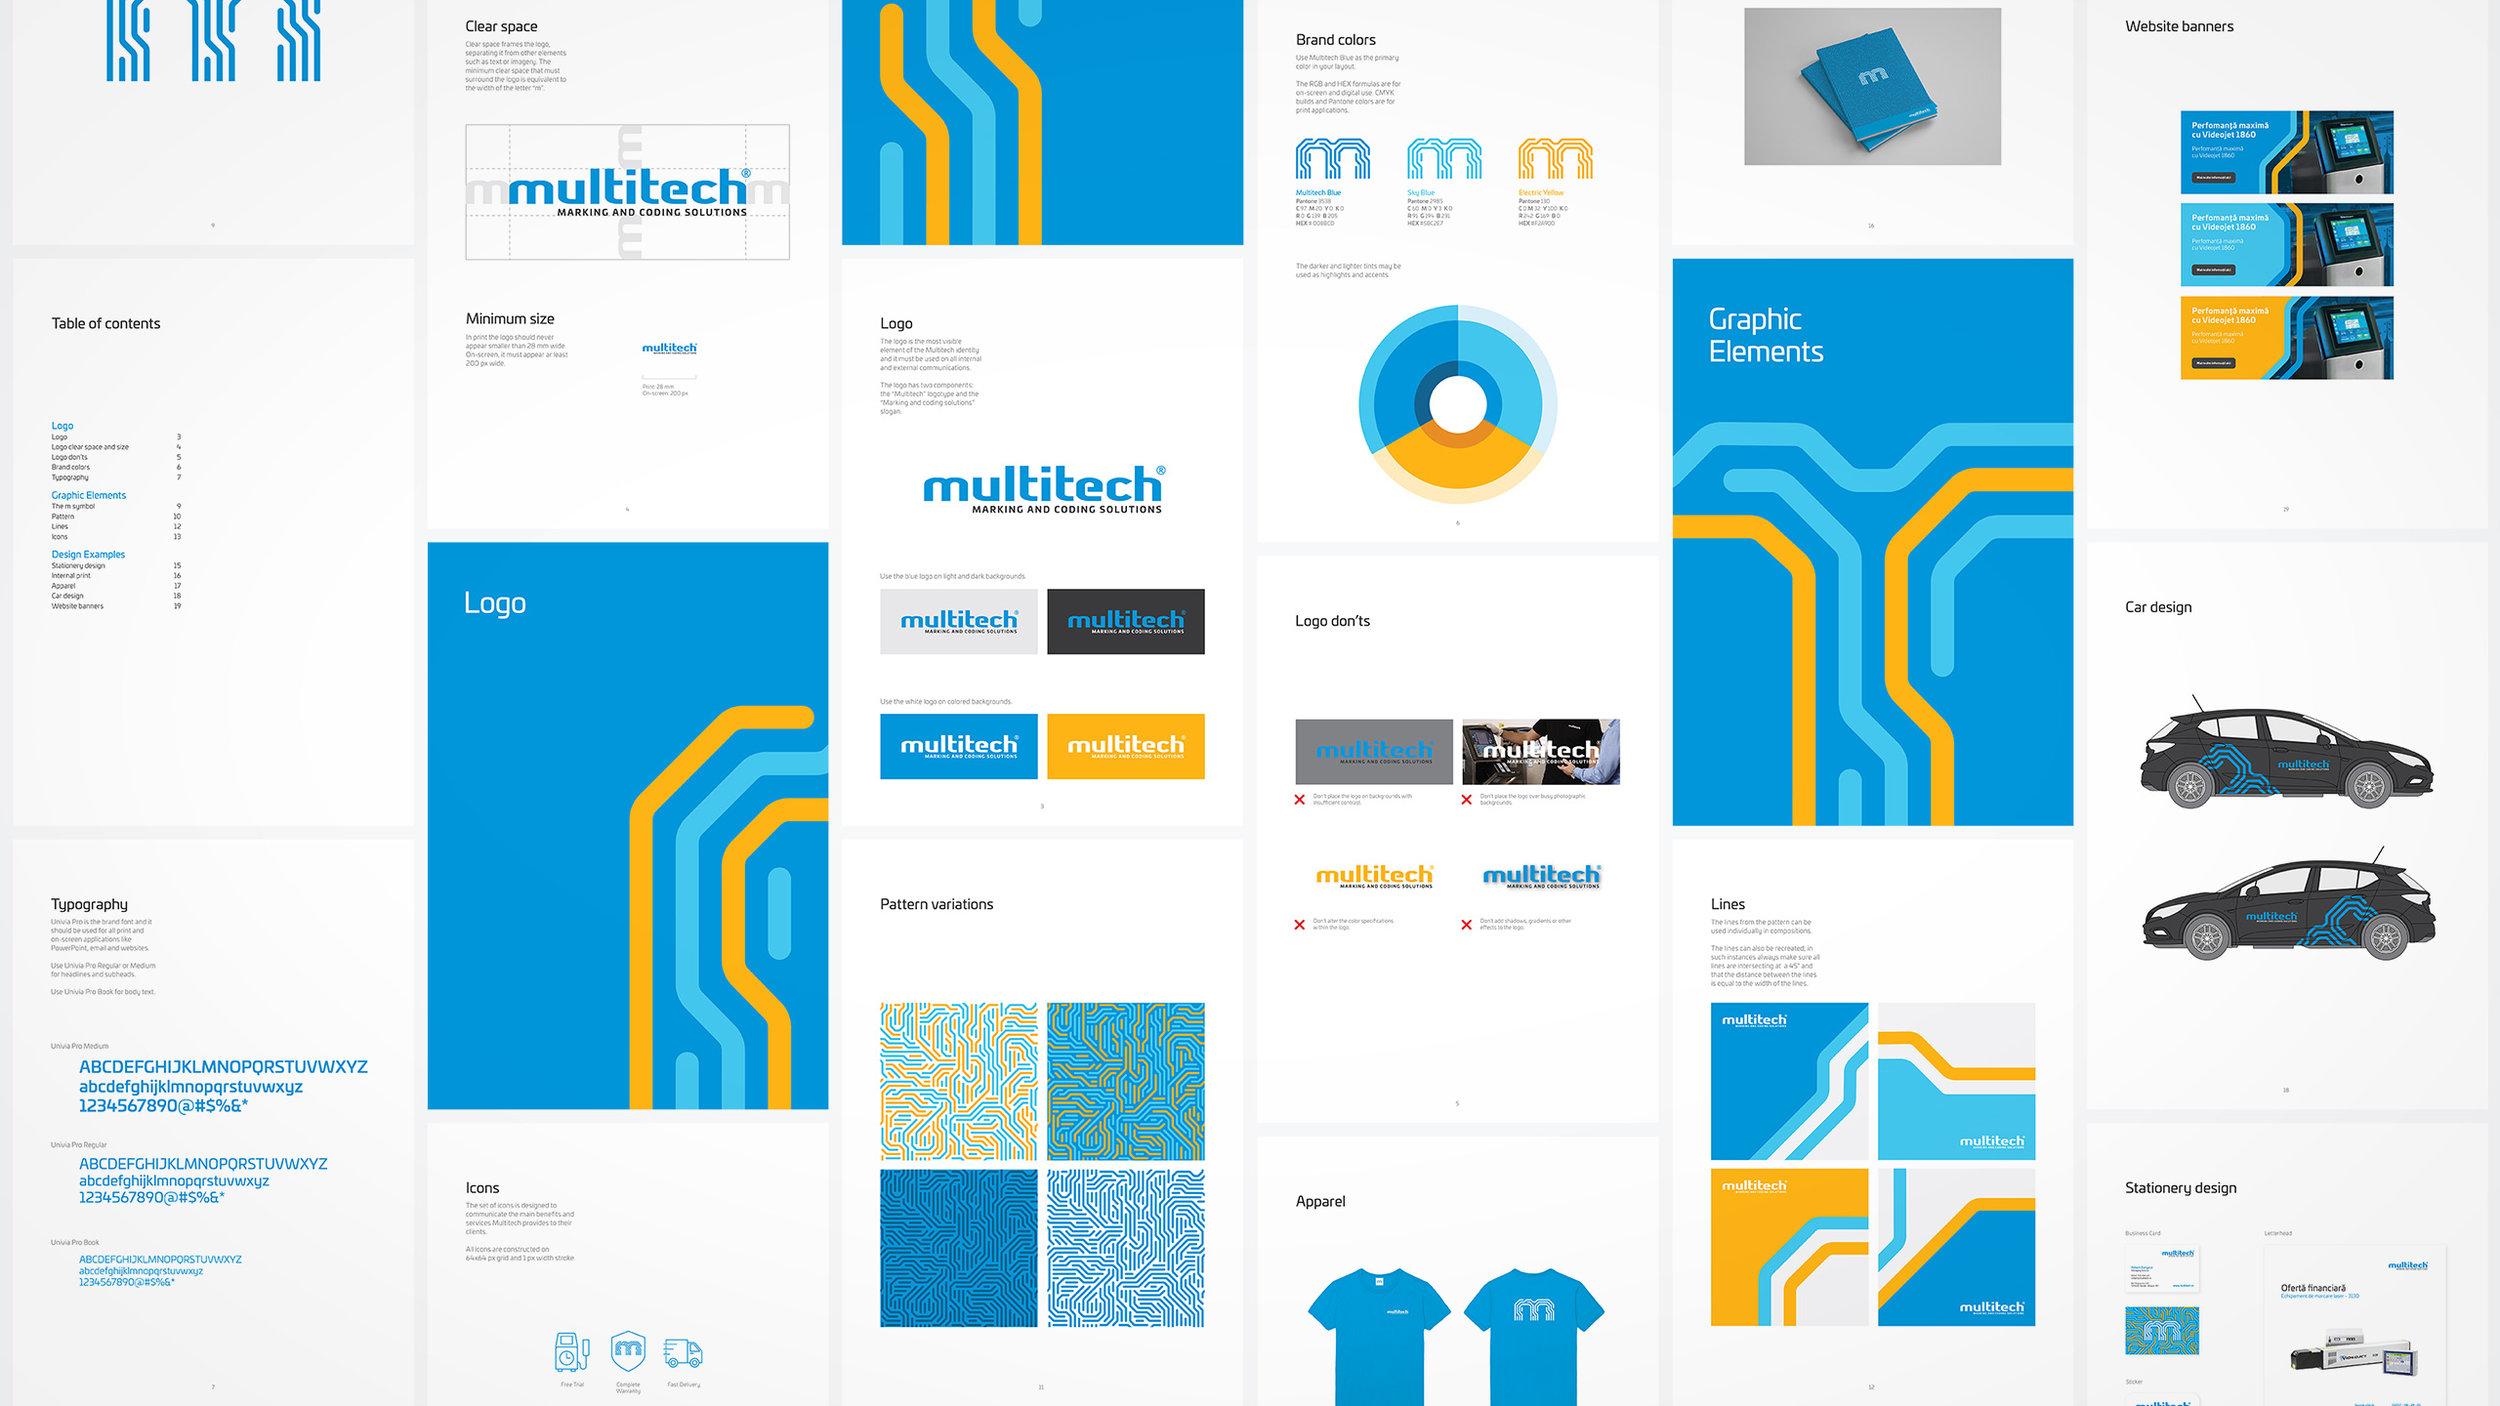 Bisigned - Multitech brand identity design - brand identity guidelines